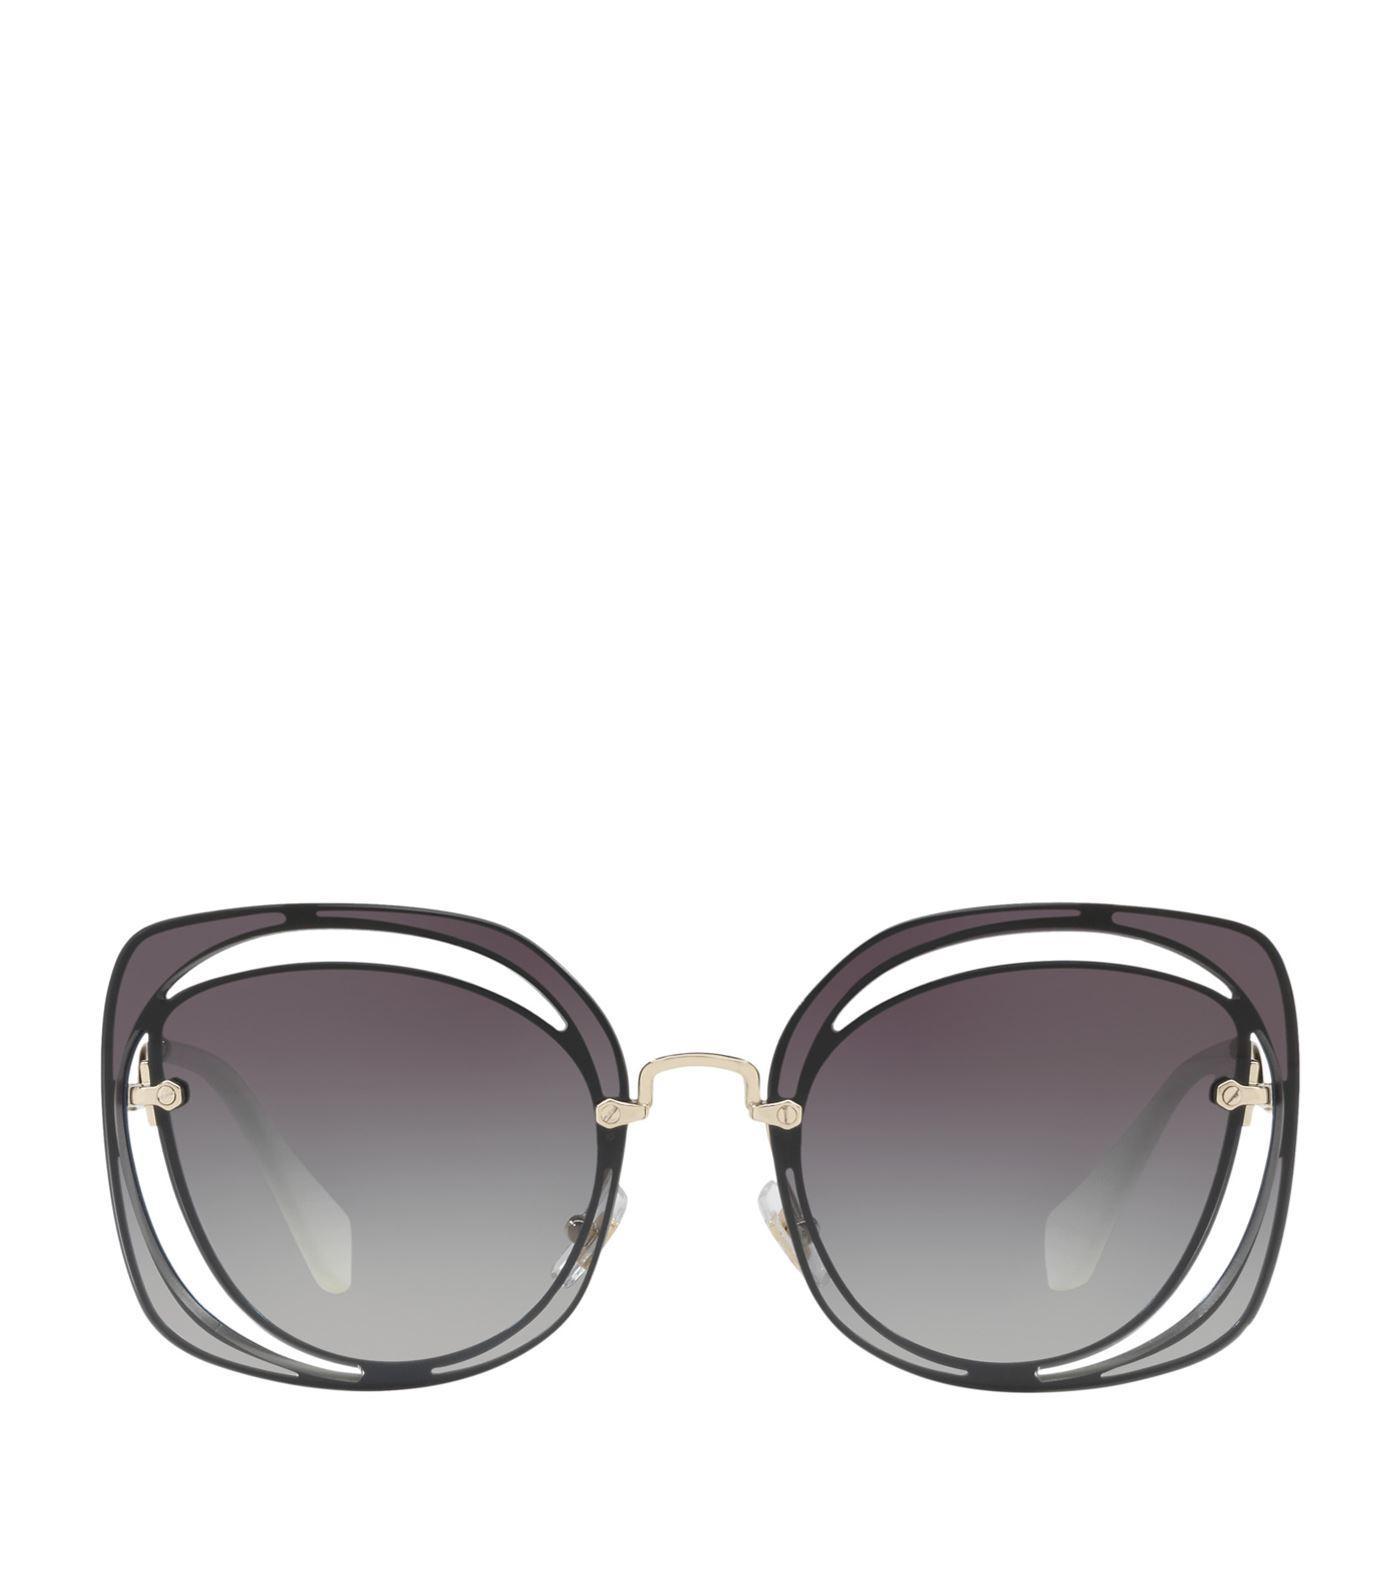 45597ab4989 Miu Miu Cut-Out Irregular Sunglasses In Grey